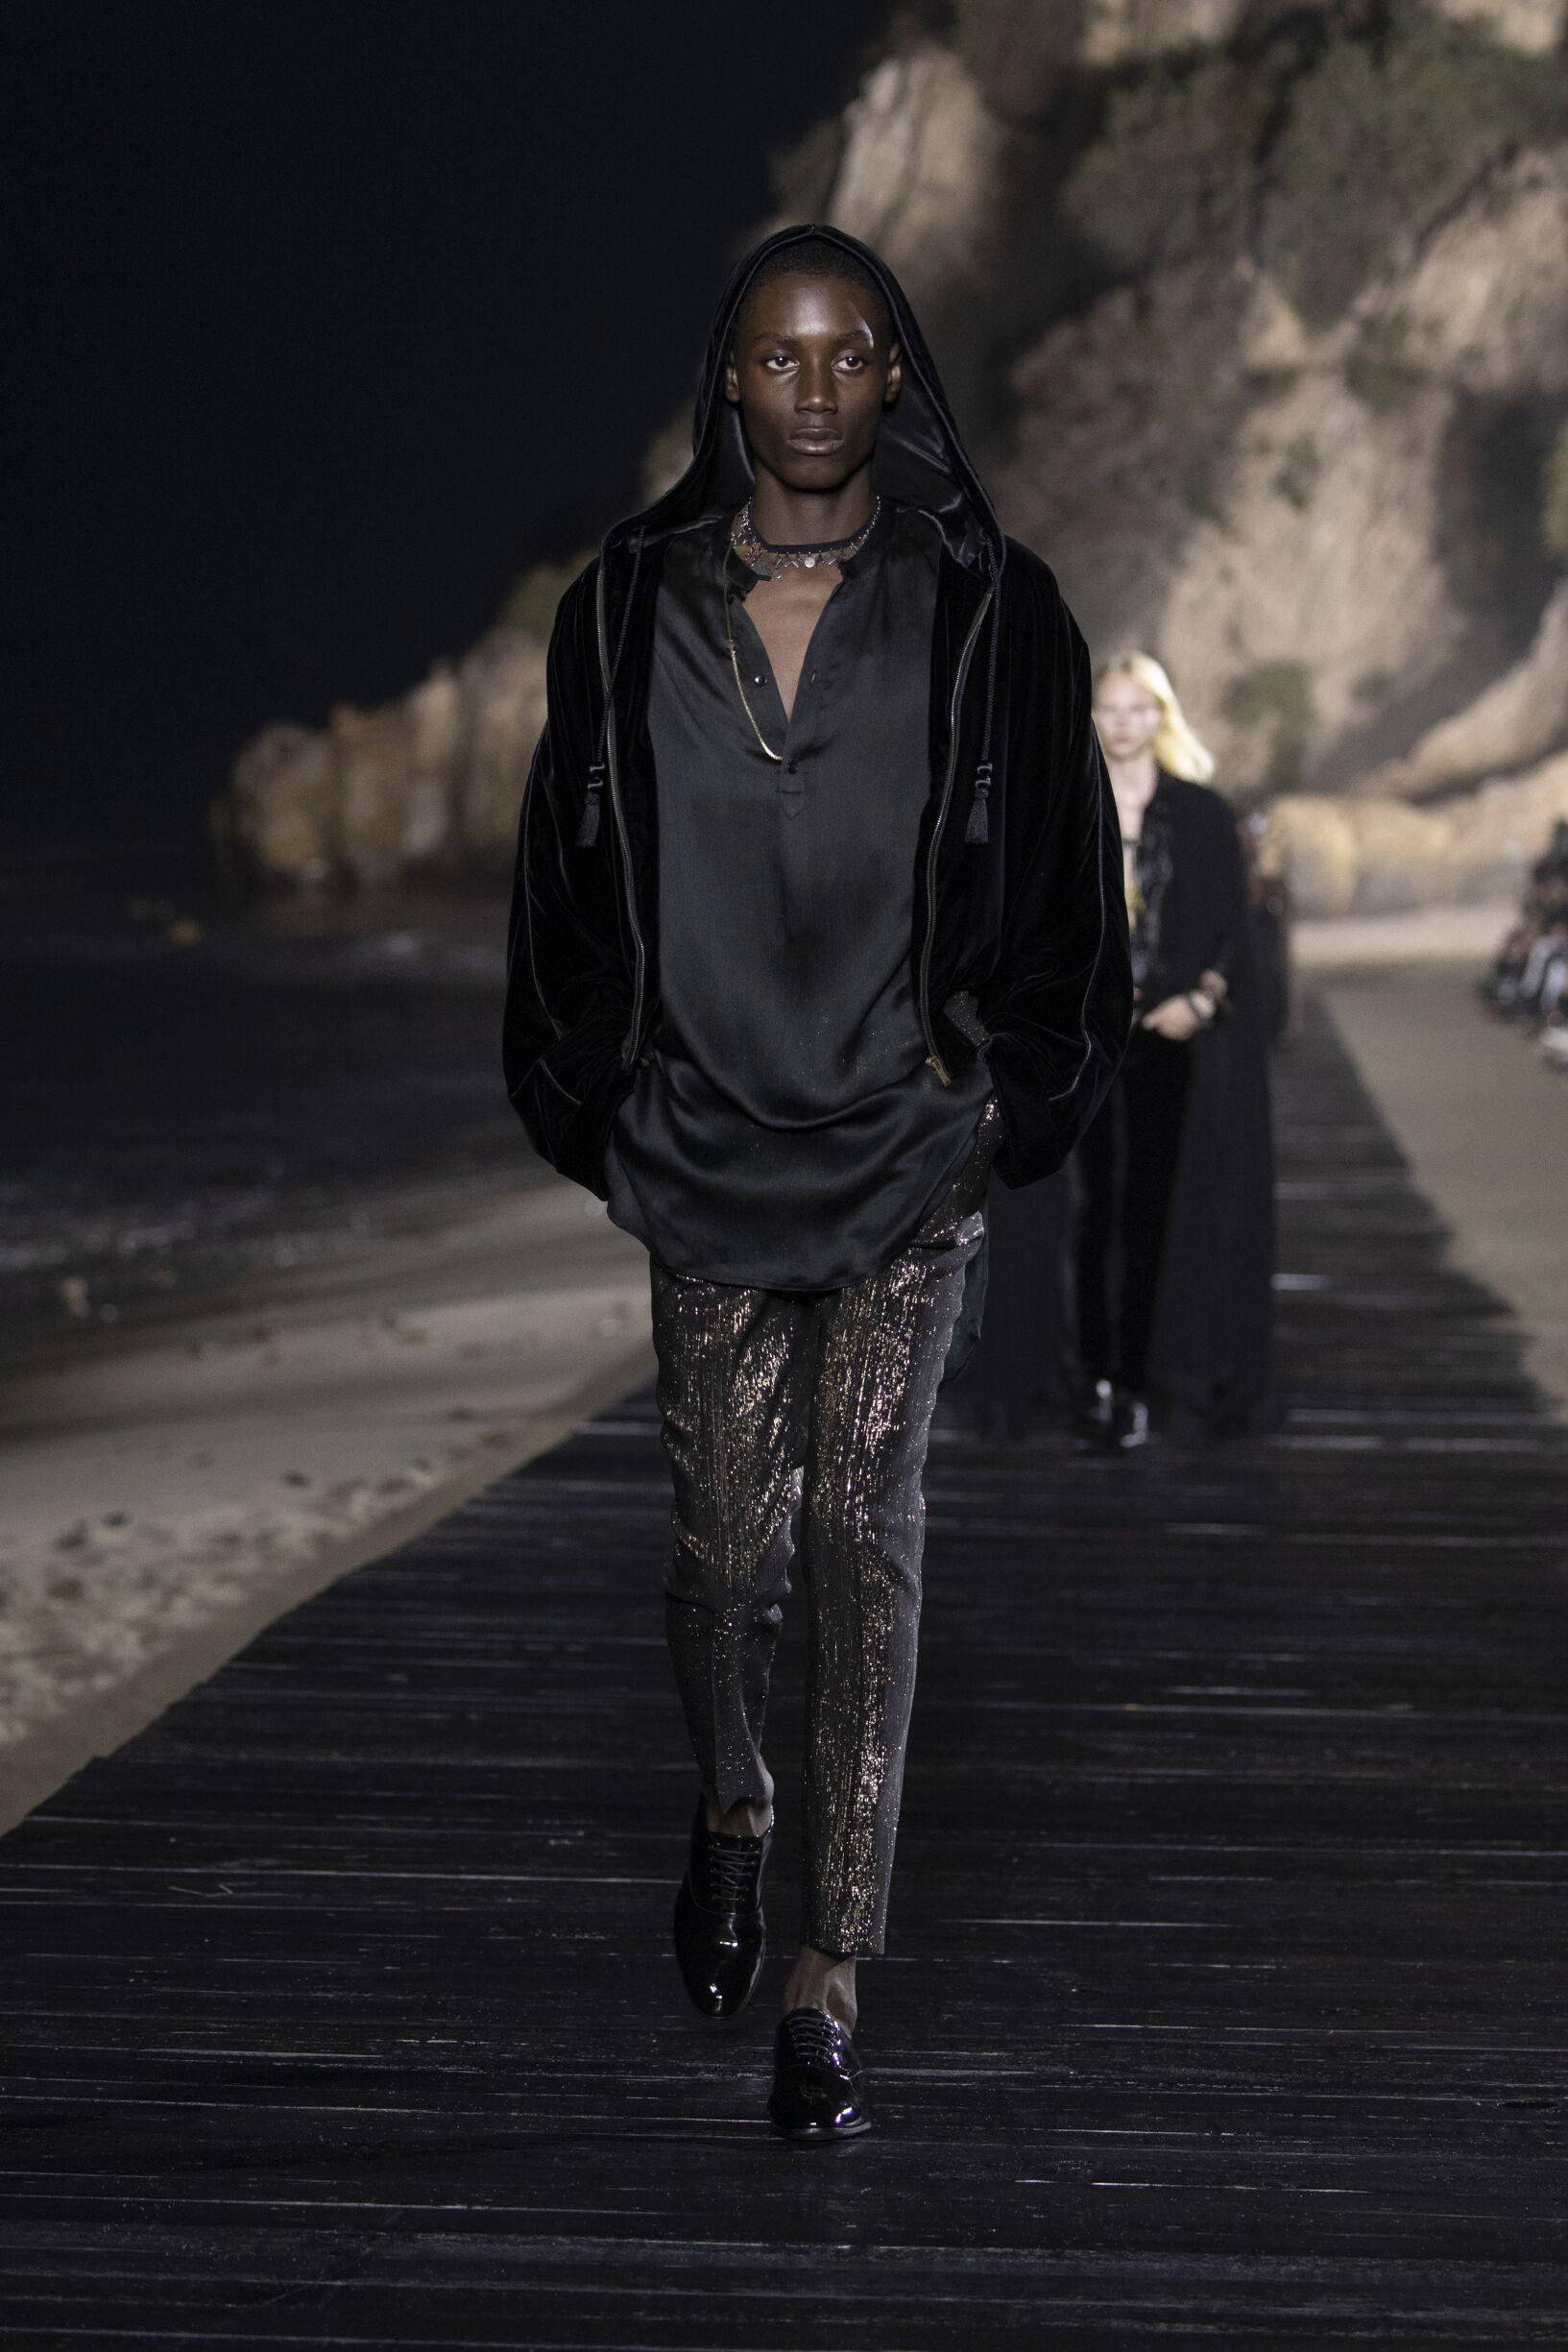 Saint Laurent Menswear Collection Trends